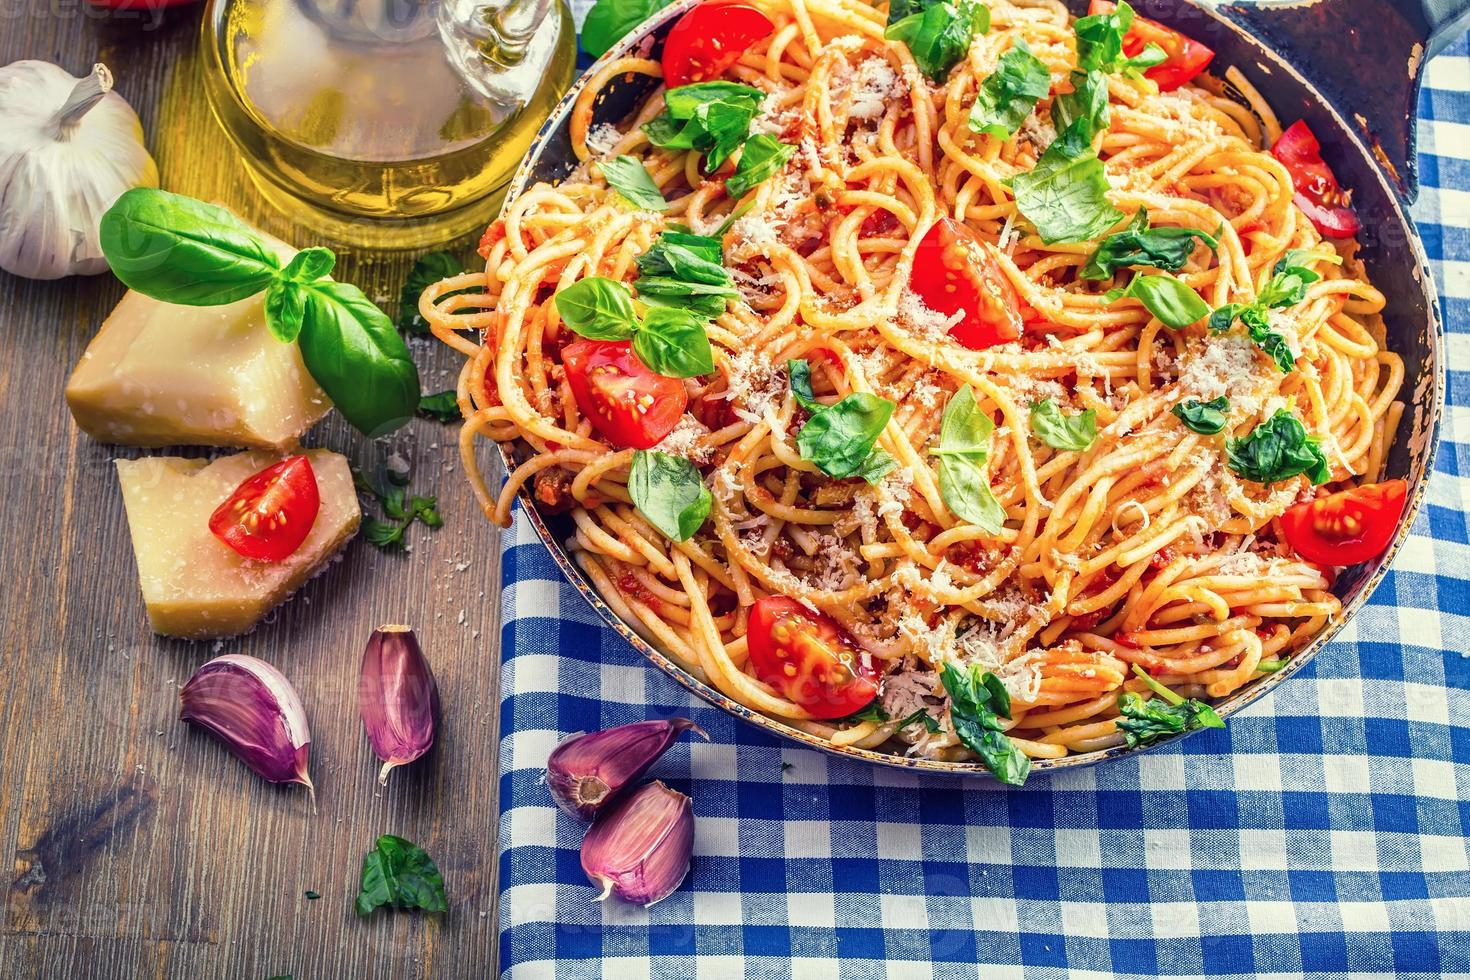 Spaghetti Bolognese mit Kirschtomate und Basilikum. foto